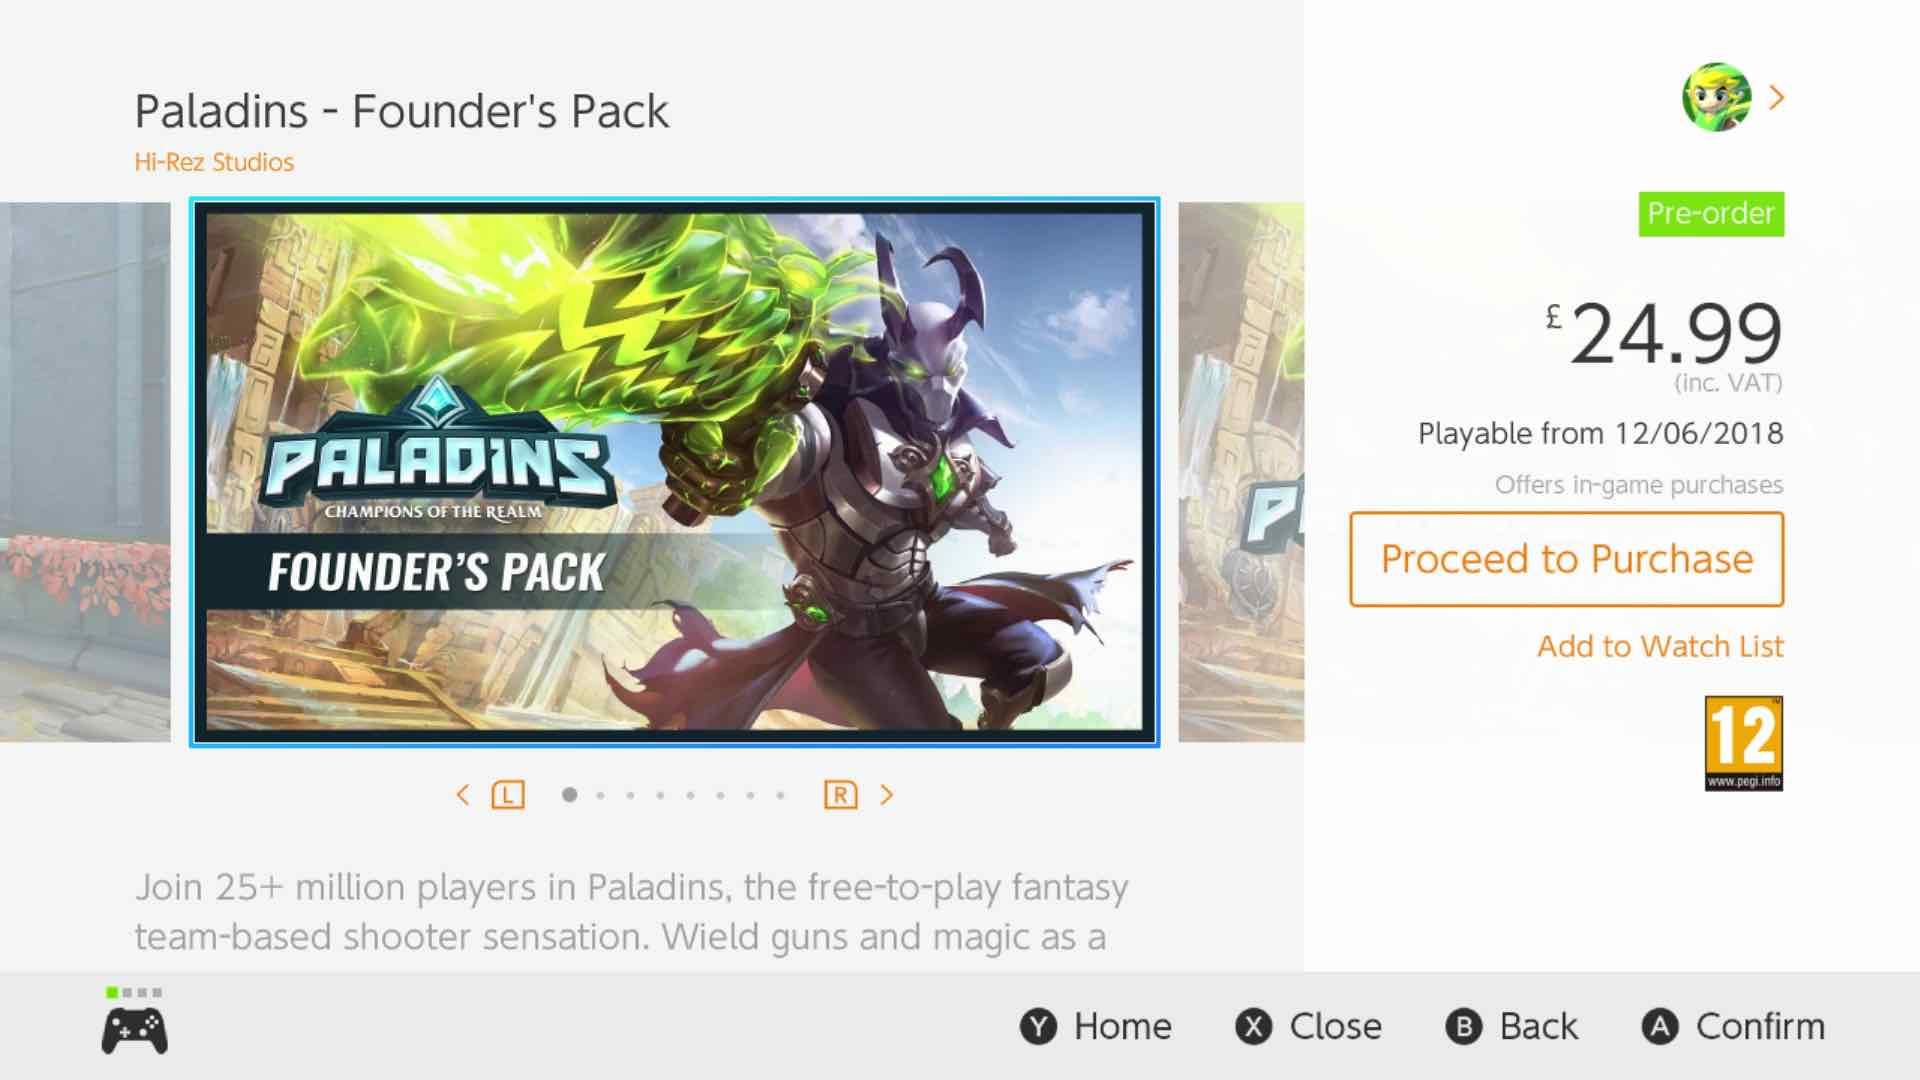 Paladins Founder's Pack Nintendo Switch Screenshot